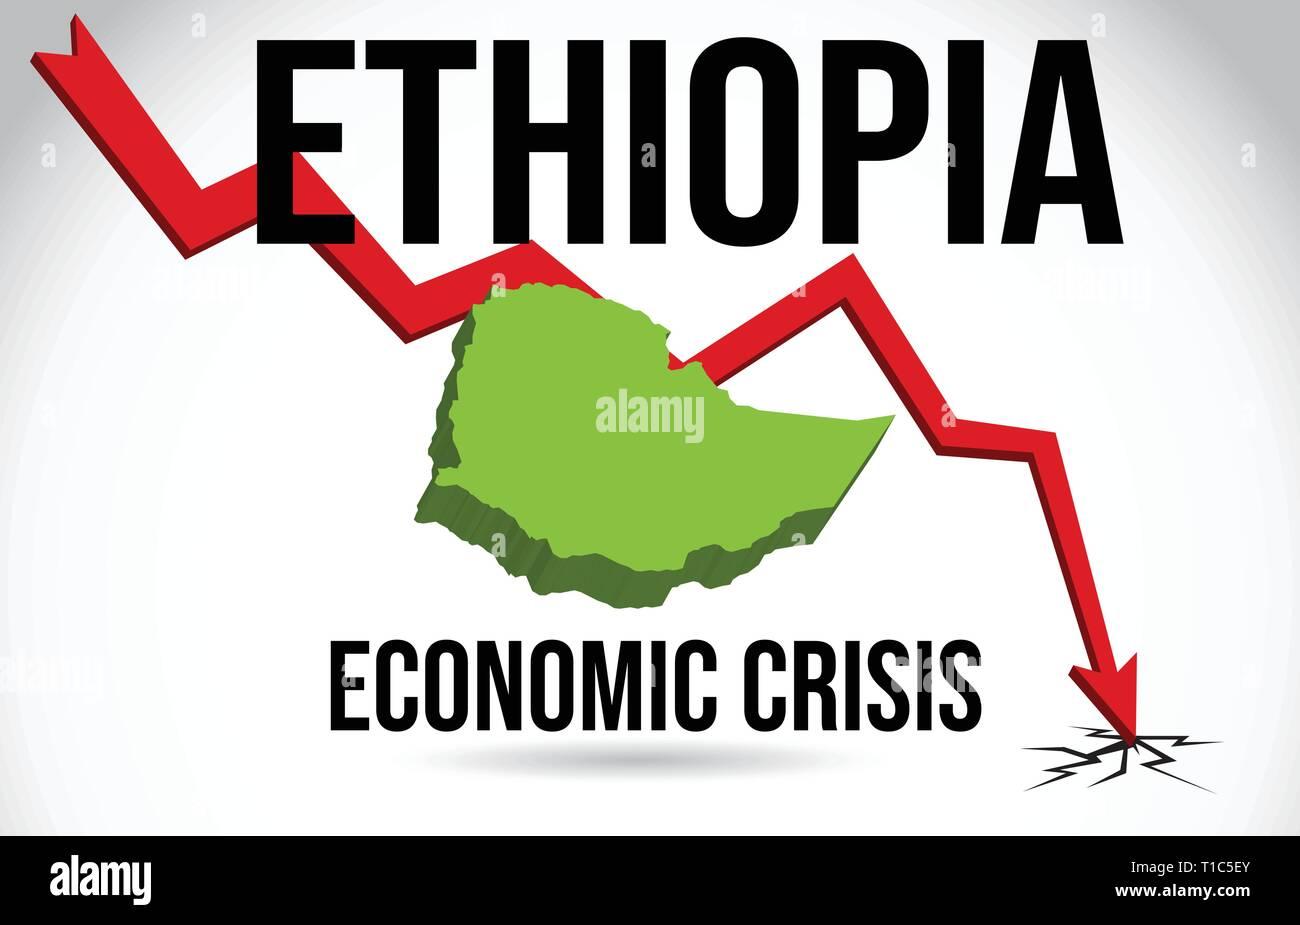 Ethiopia Map Financial Crisis Economic Collapse Market Crash Global Meltdown Vector Illustration. - Stock Vector